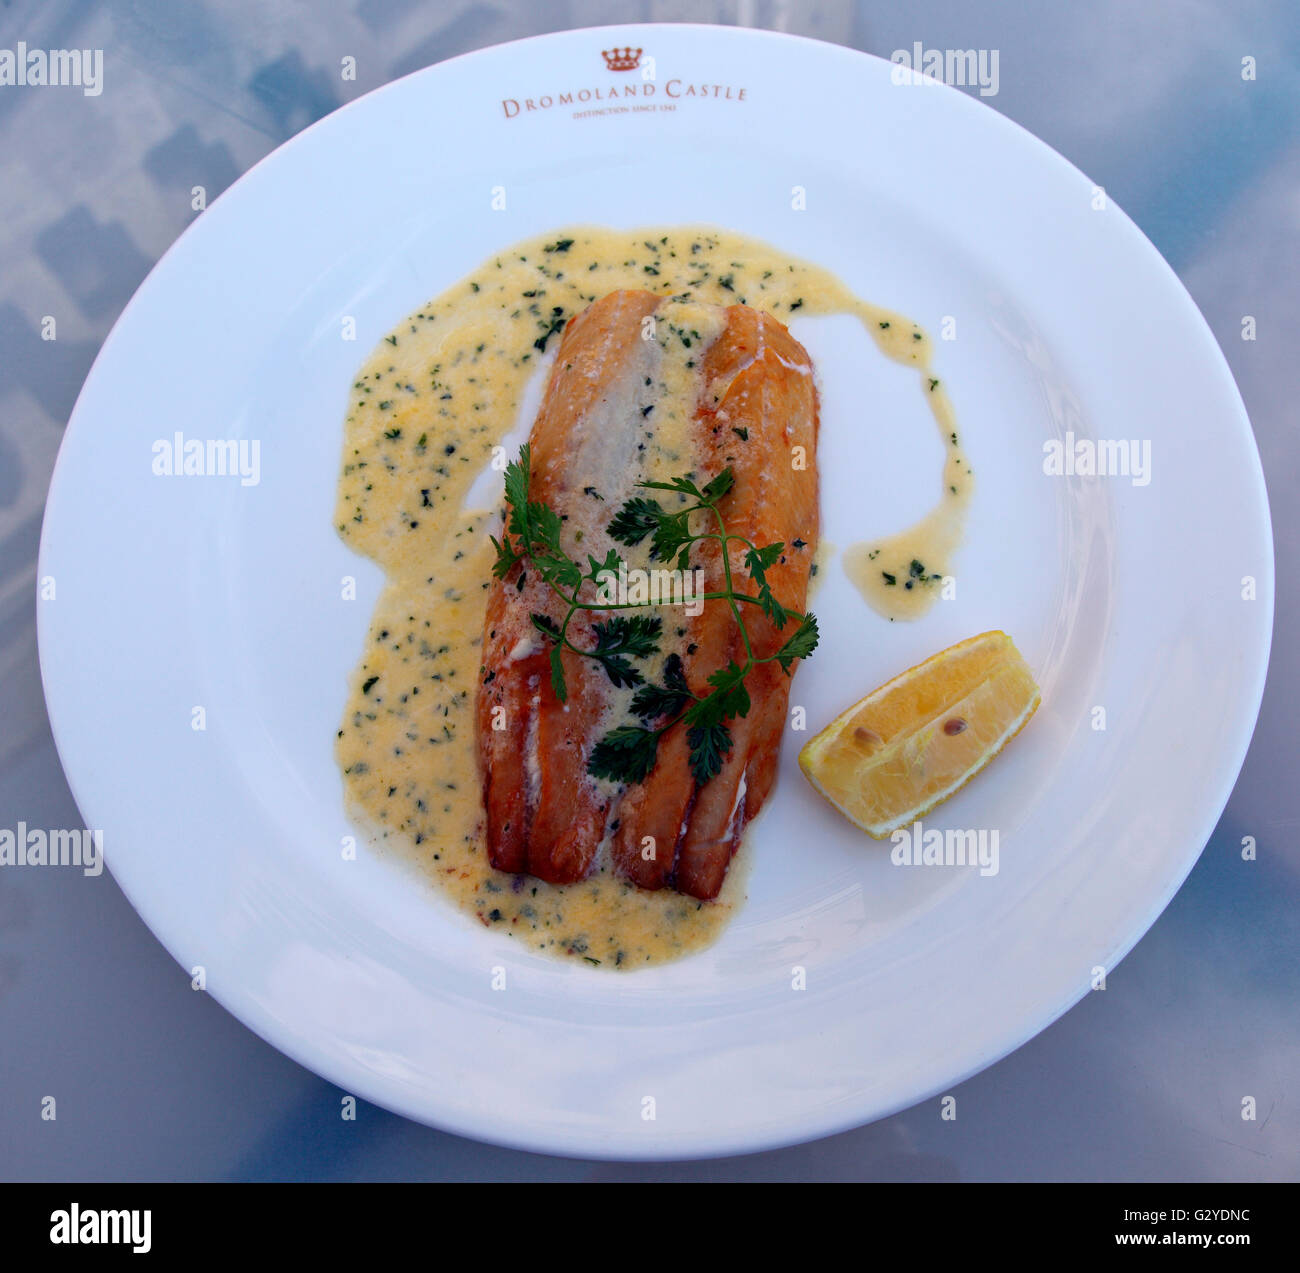 Breakfast kipper served at Dromoland Castle - Stock Image